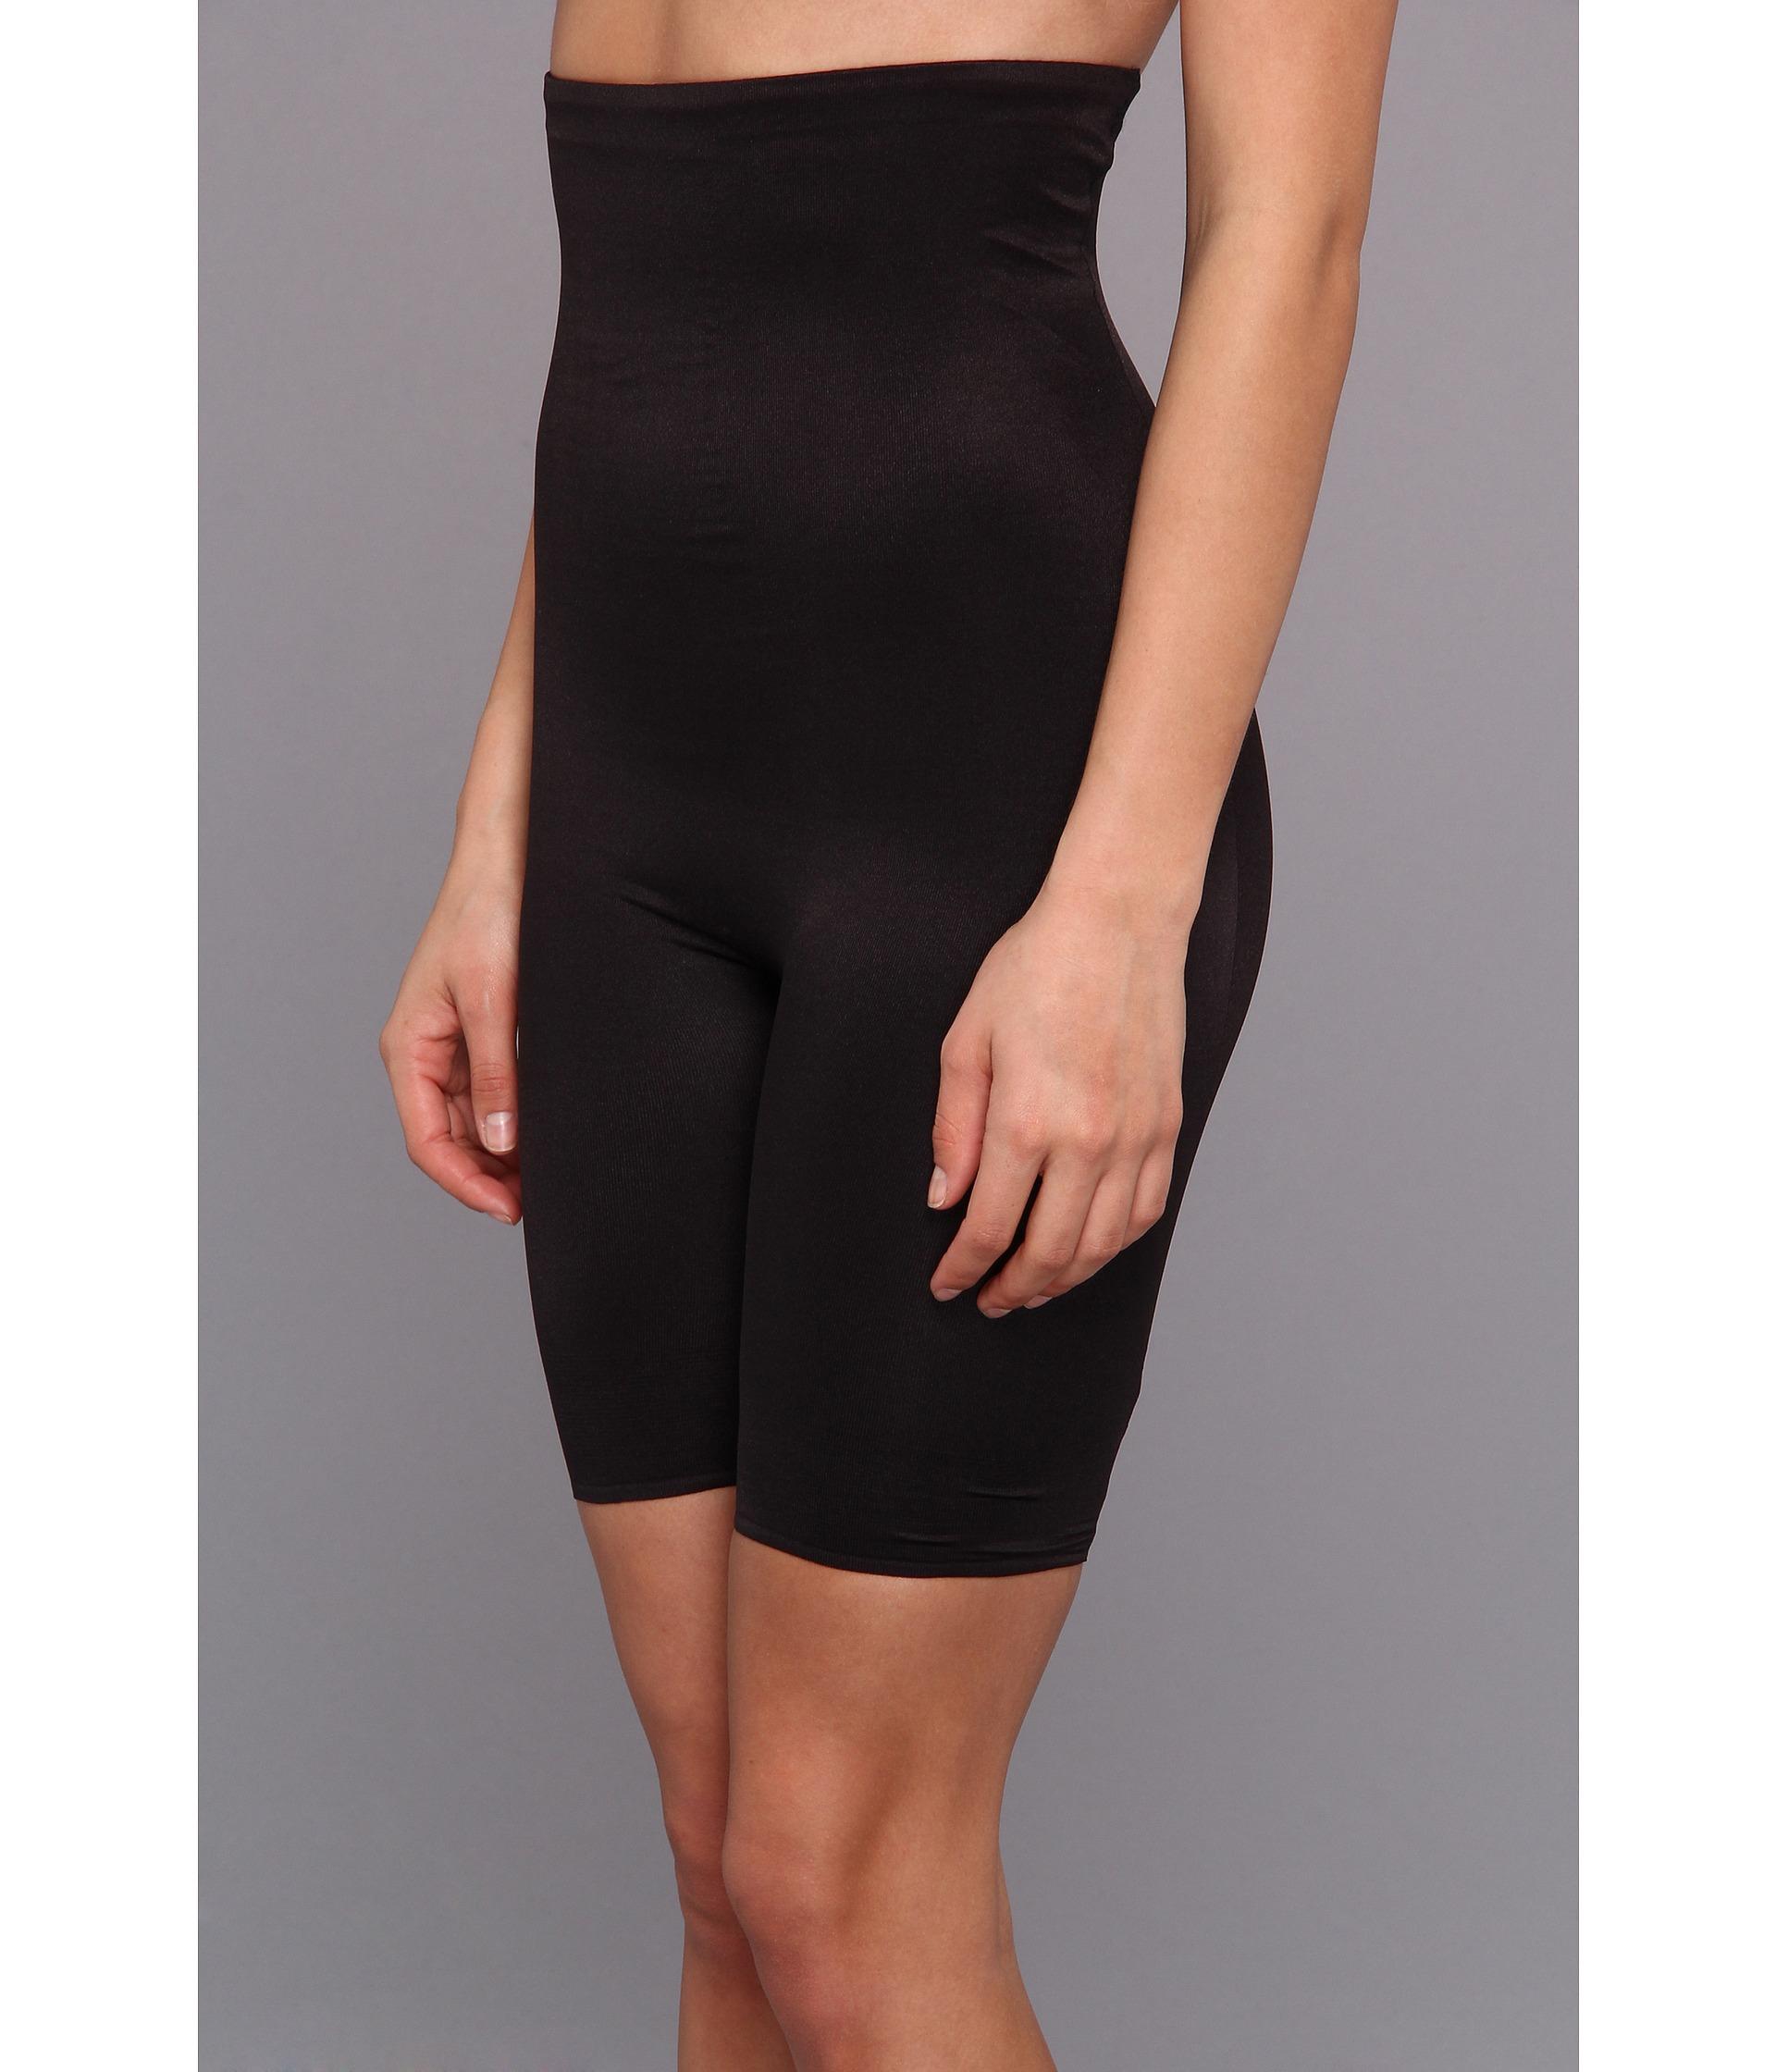 d016ebc9a6c Lyst - Tc Fine Intimates Even More® Triple-ply Midriff Hi-waist ...